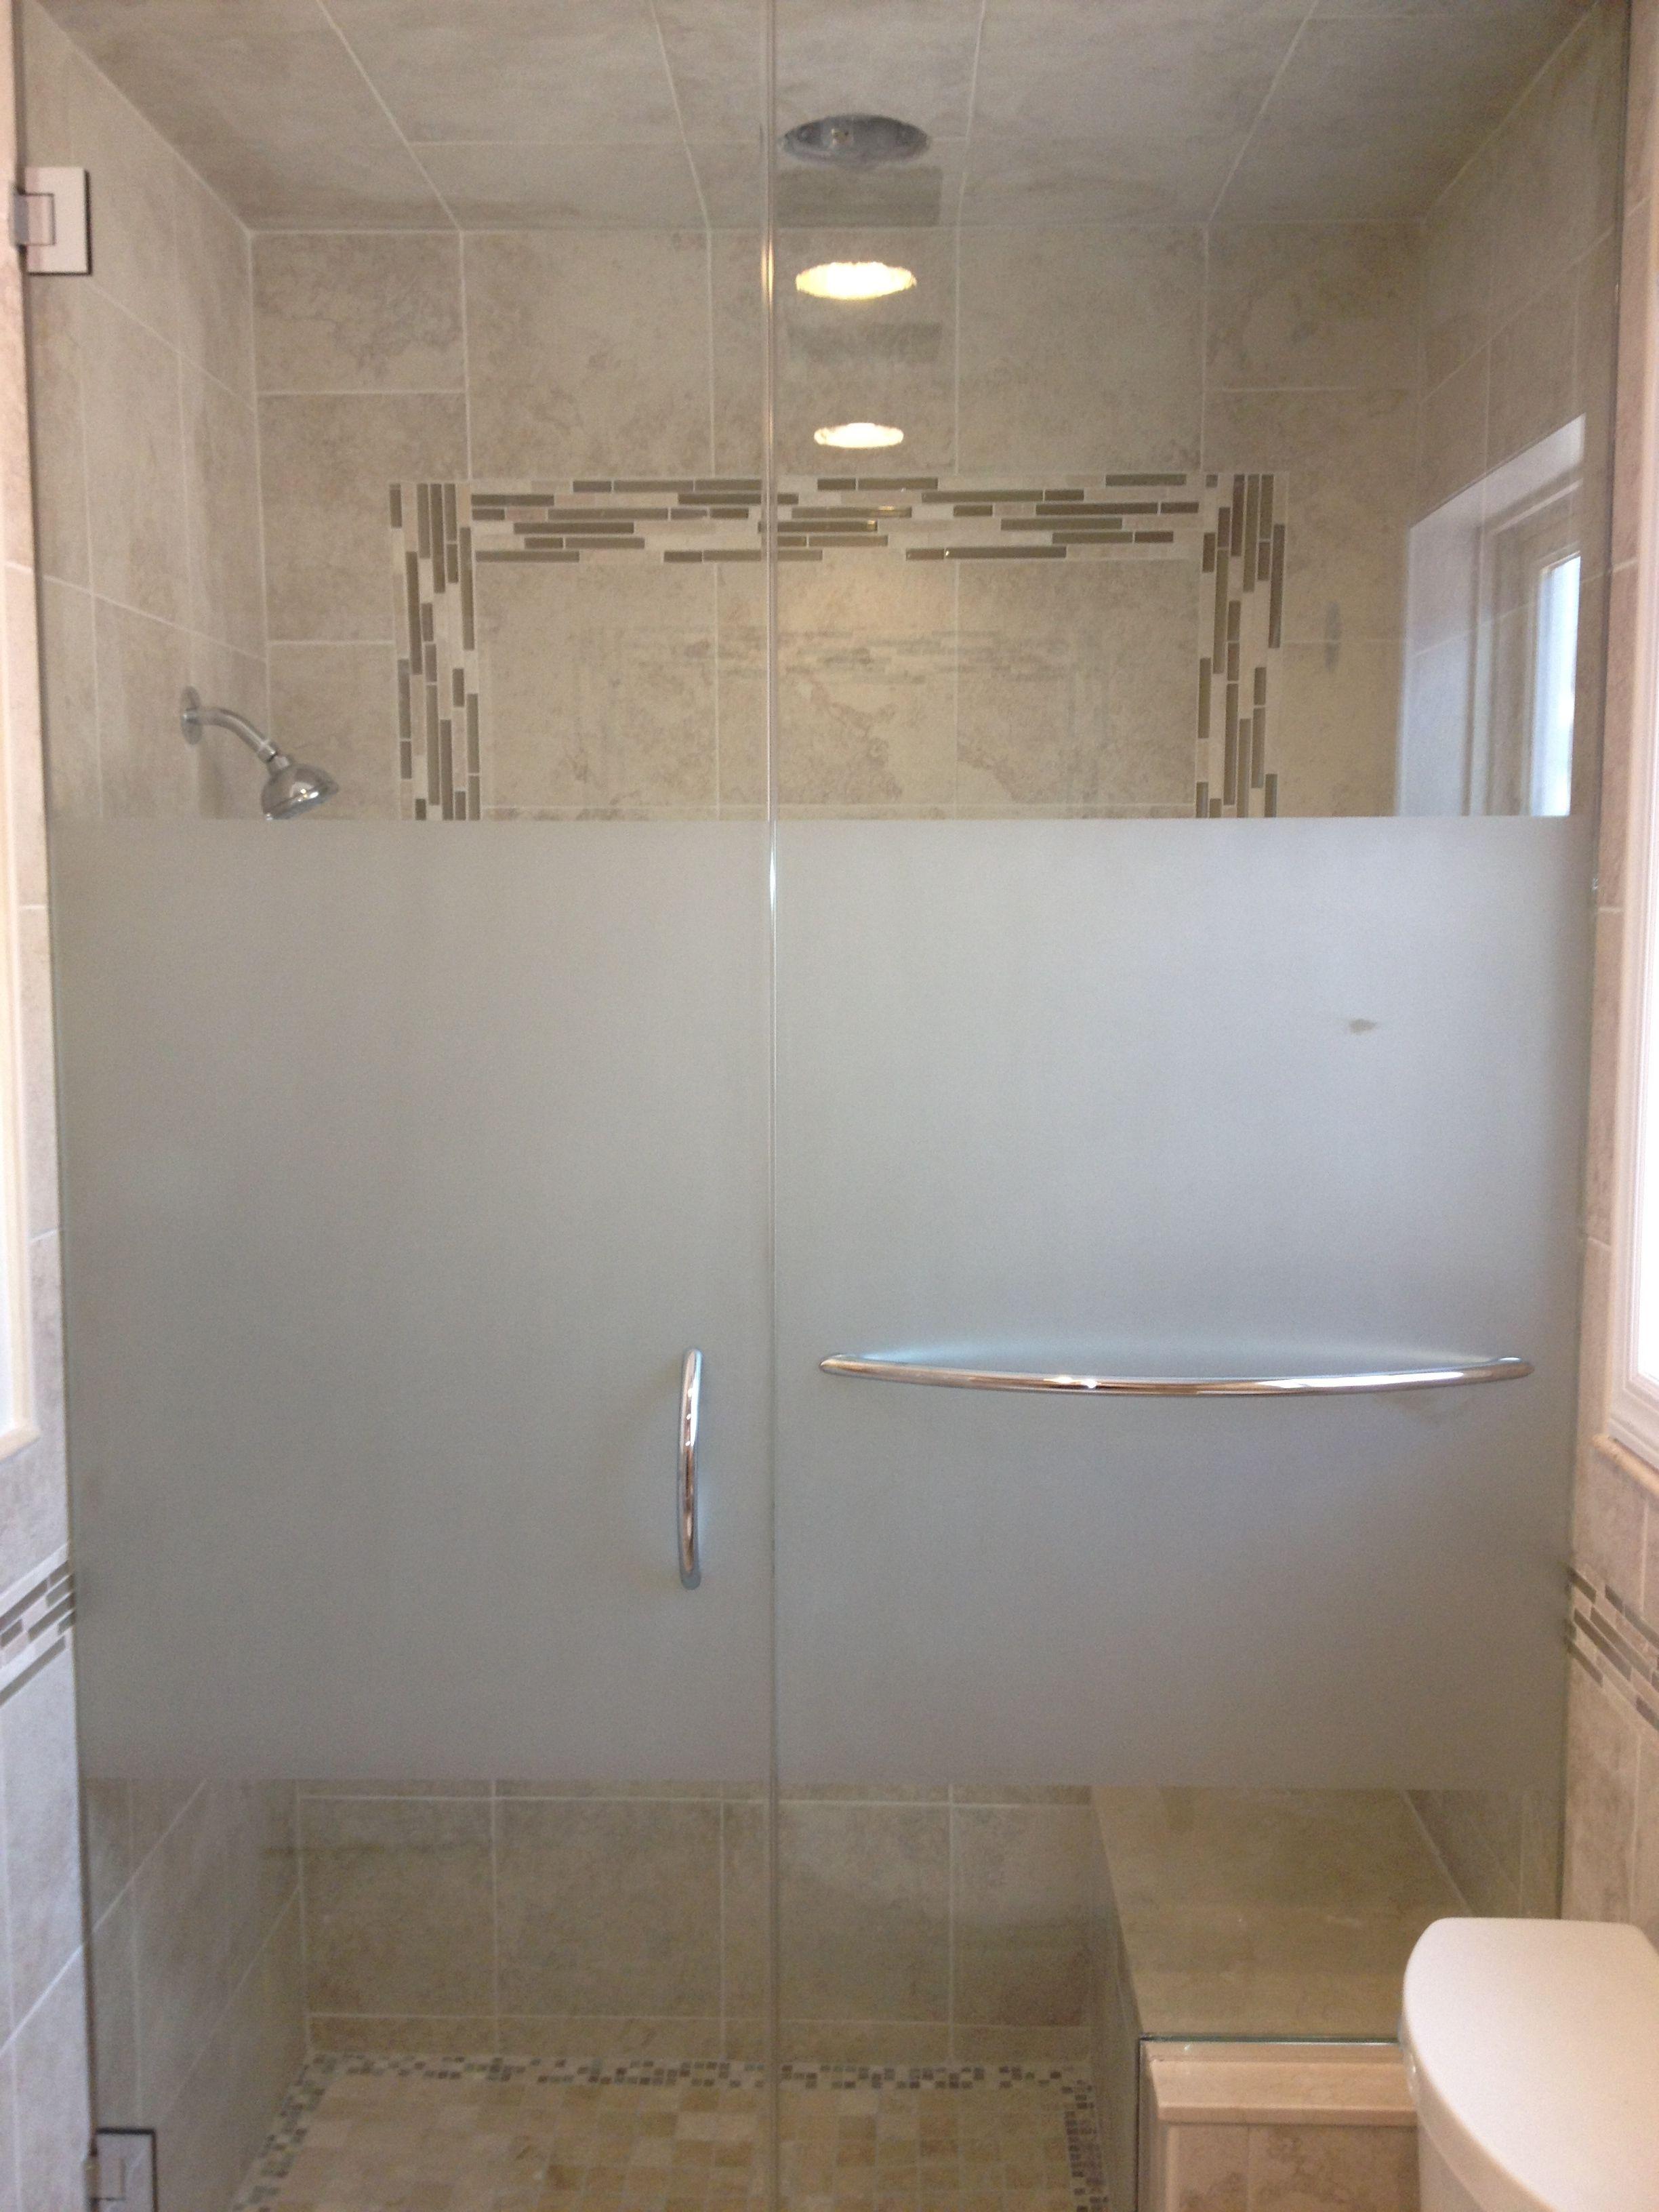 Privacy Film For Glass Shower Doors Glass Shower Doors